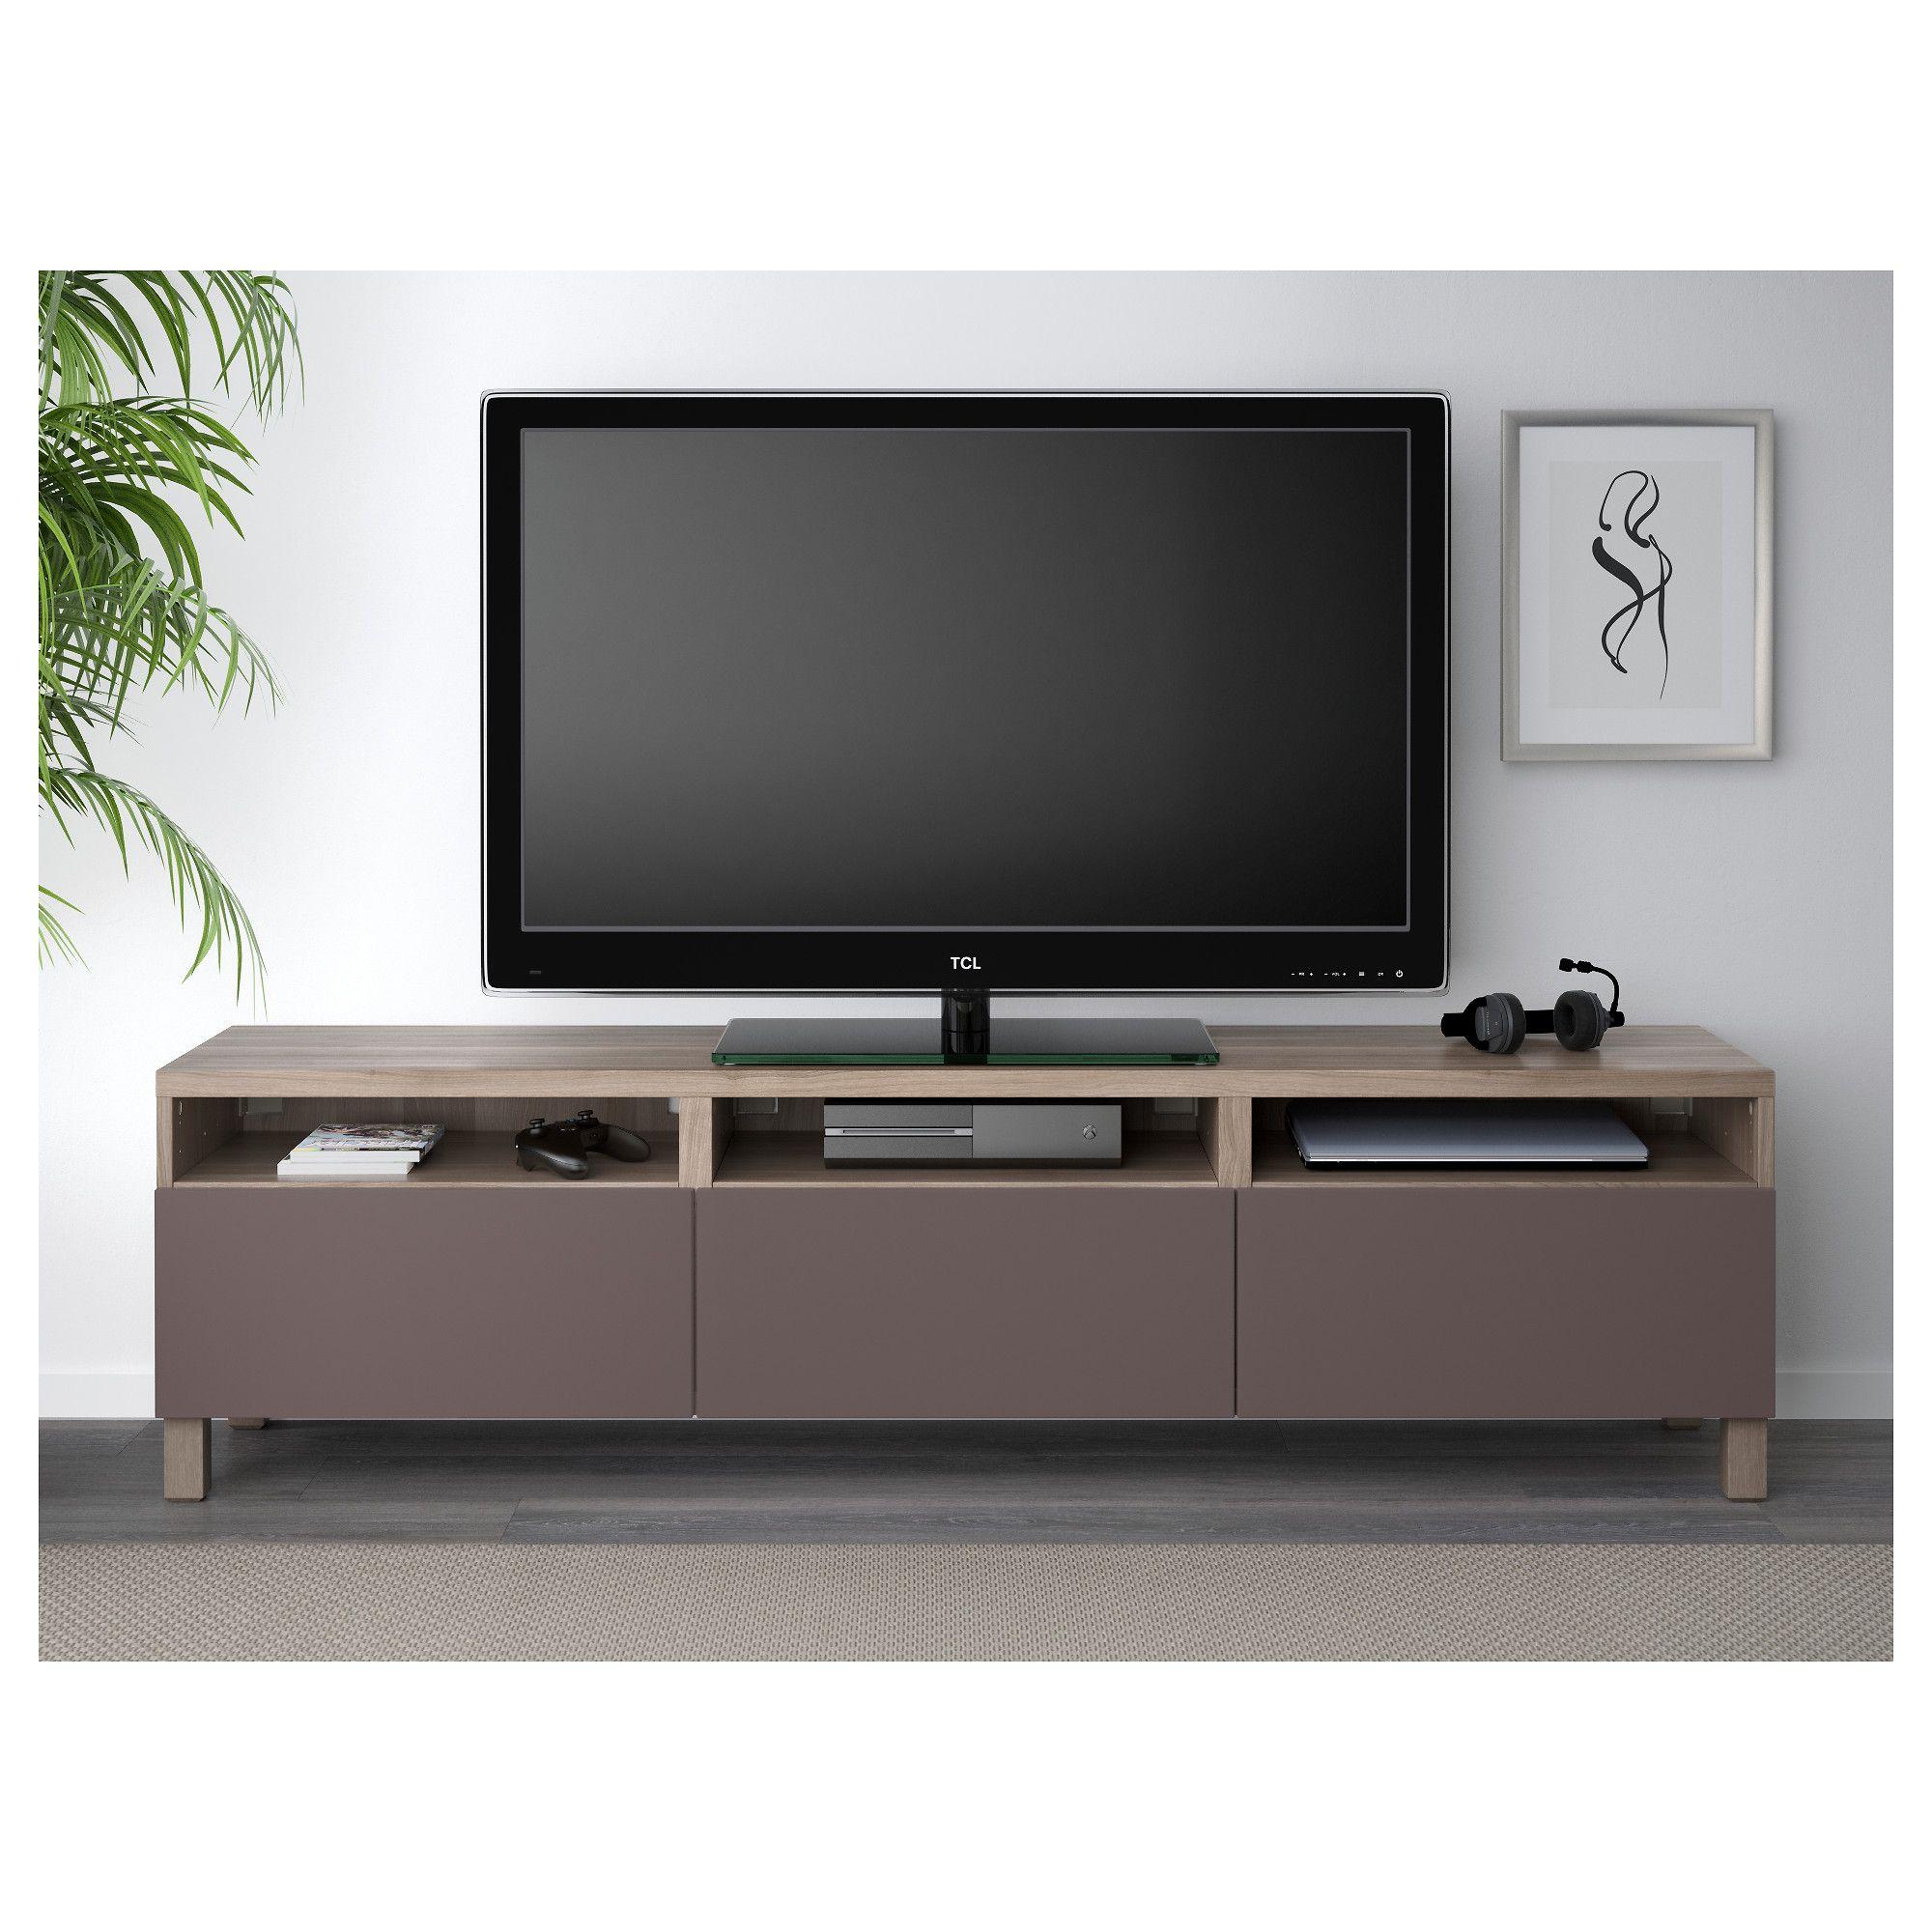 ikea - bestÅ tv unit with drawers walnut effect light gray, valviken